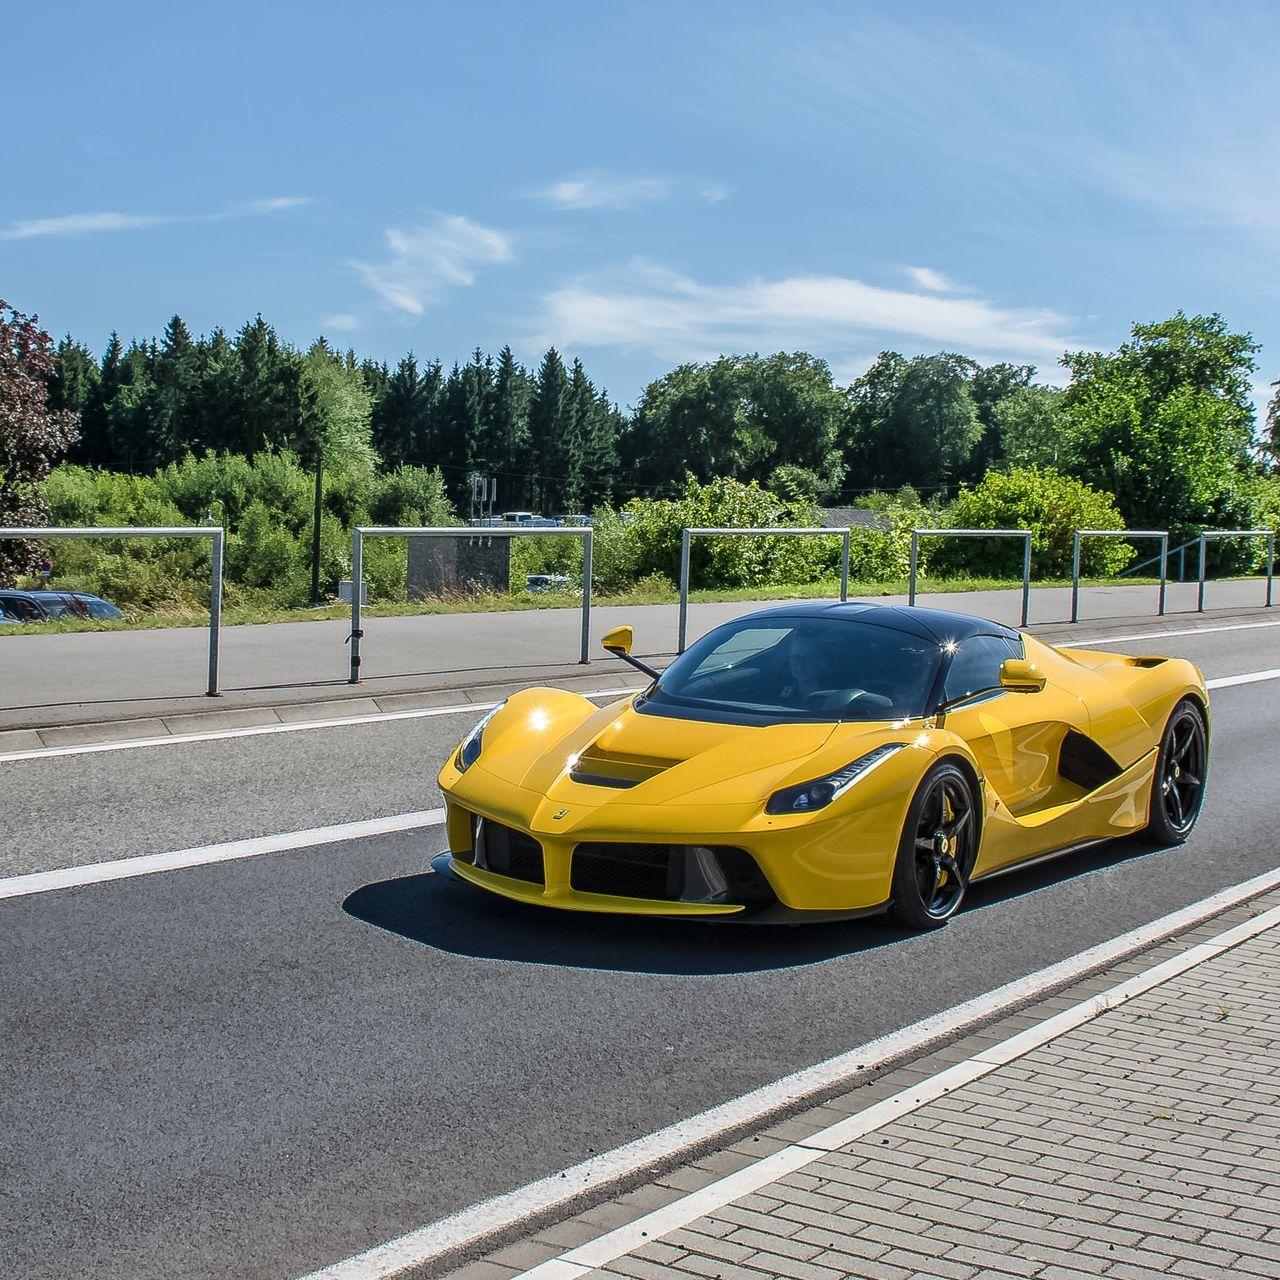 Ferrari Laferrari in Nürburgring Ferrari Yellow LaFerrari Nurburgring Car Germany Photography Blacklist